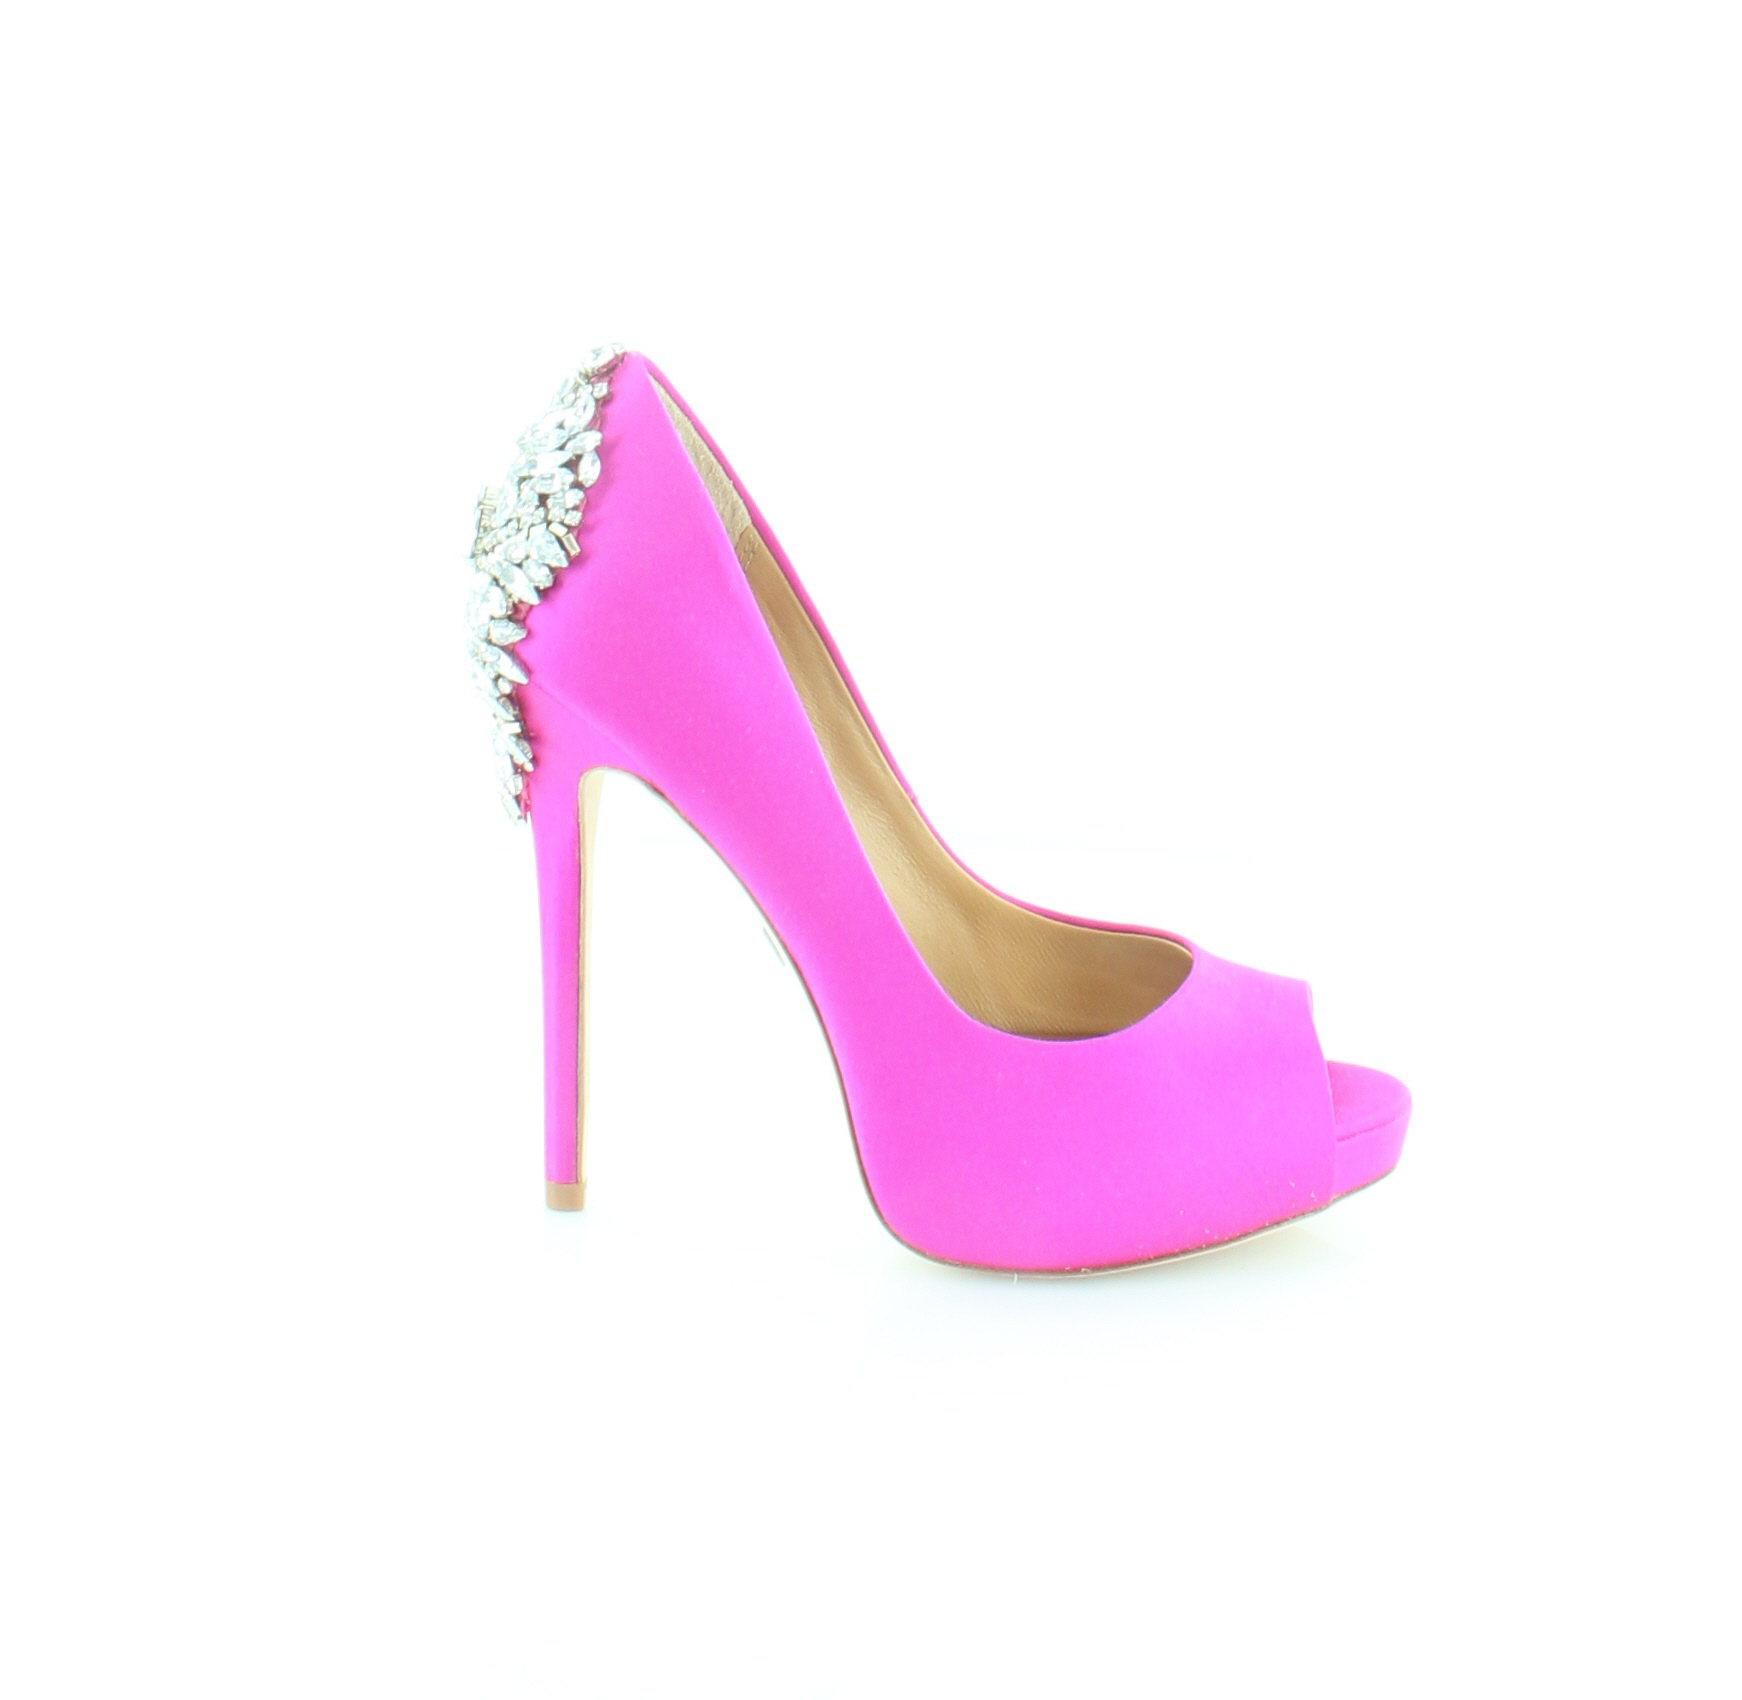 Badgley Mischka New Kiara Pink Donna Shoes Size 6 M Heels MSRP  245